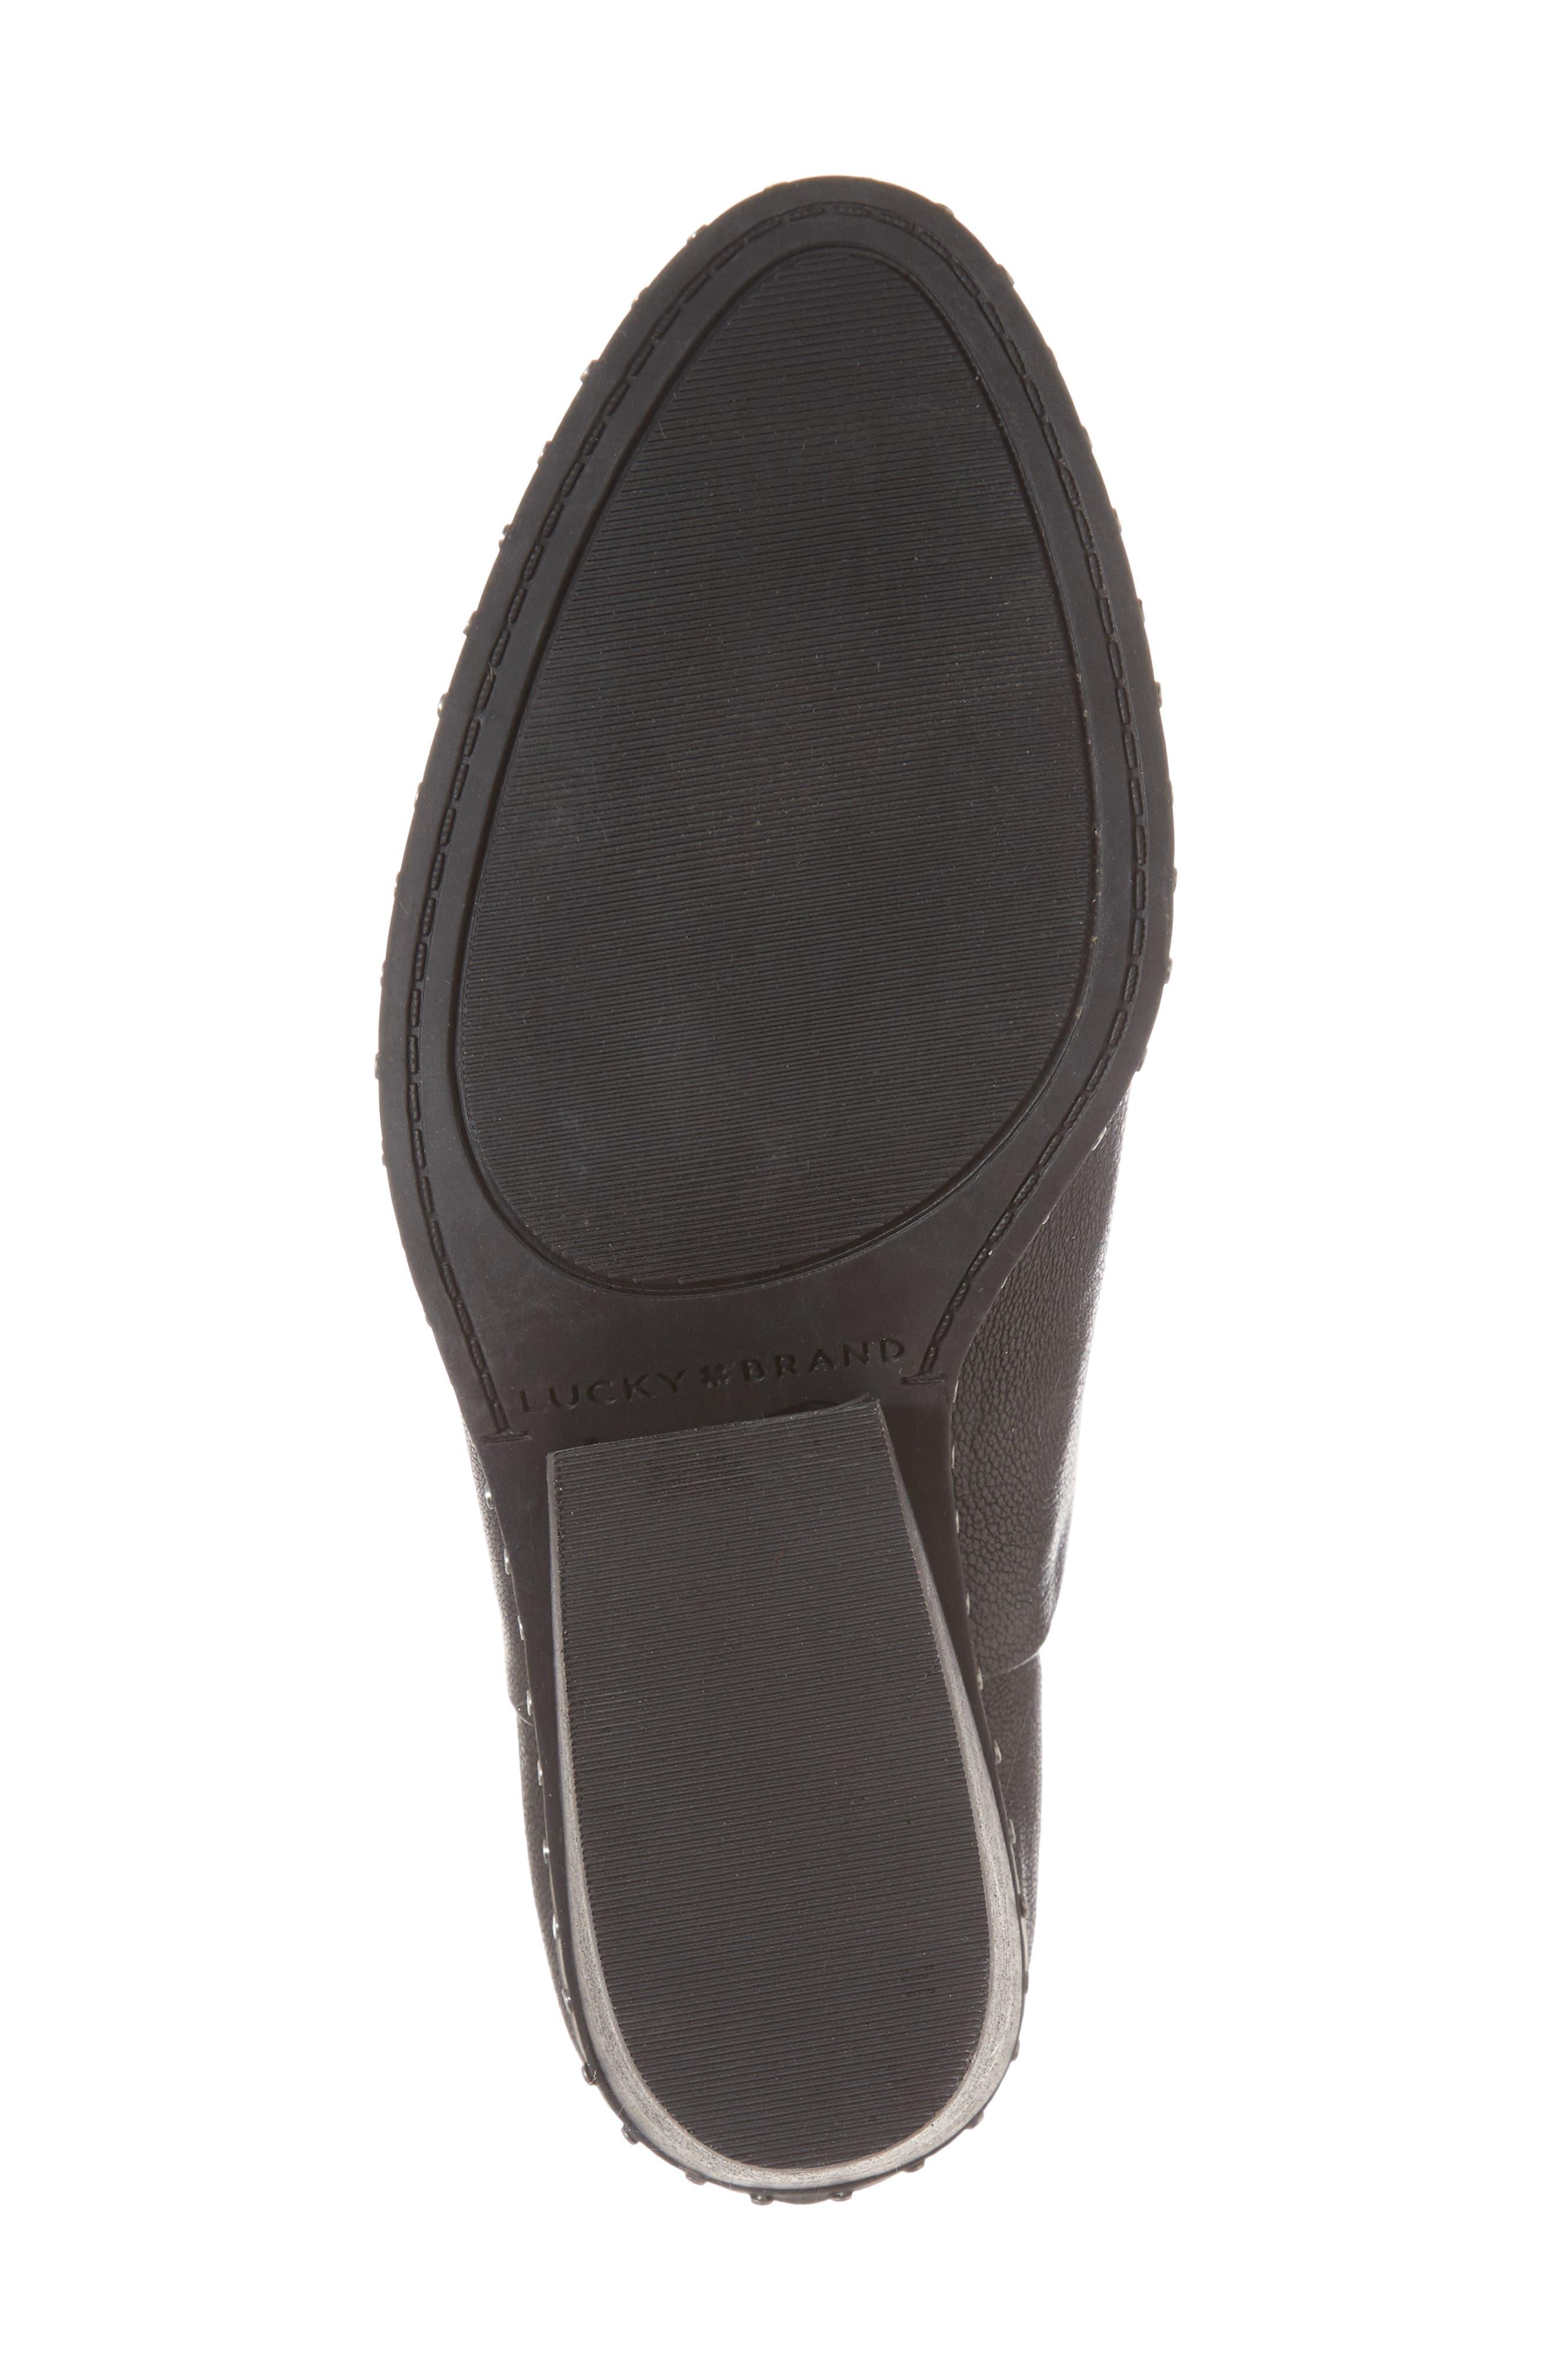 Lezzlee II Bootie,                             Alternate thumbnail 6, color,                             Black Leather